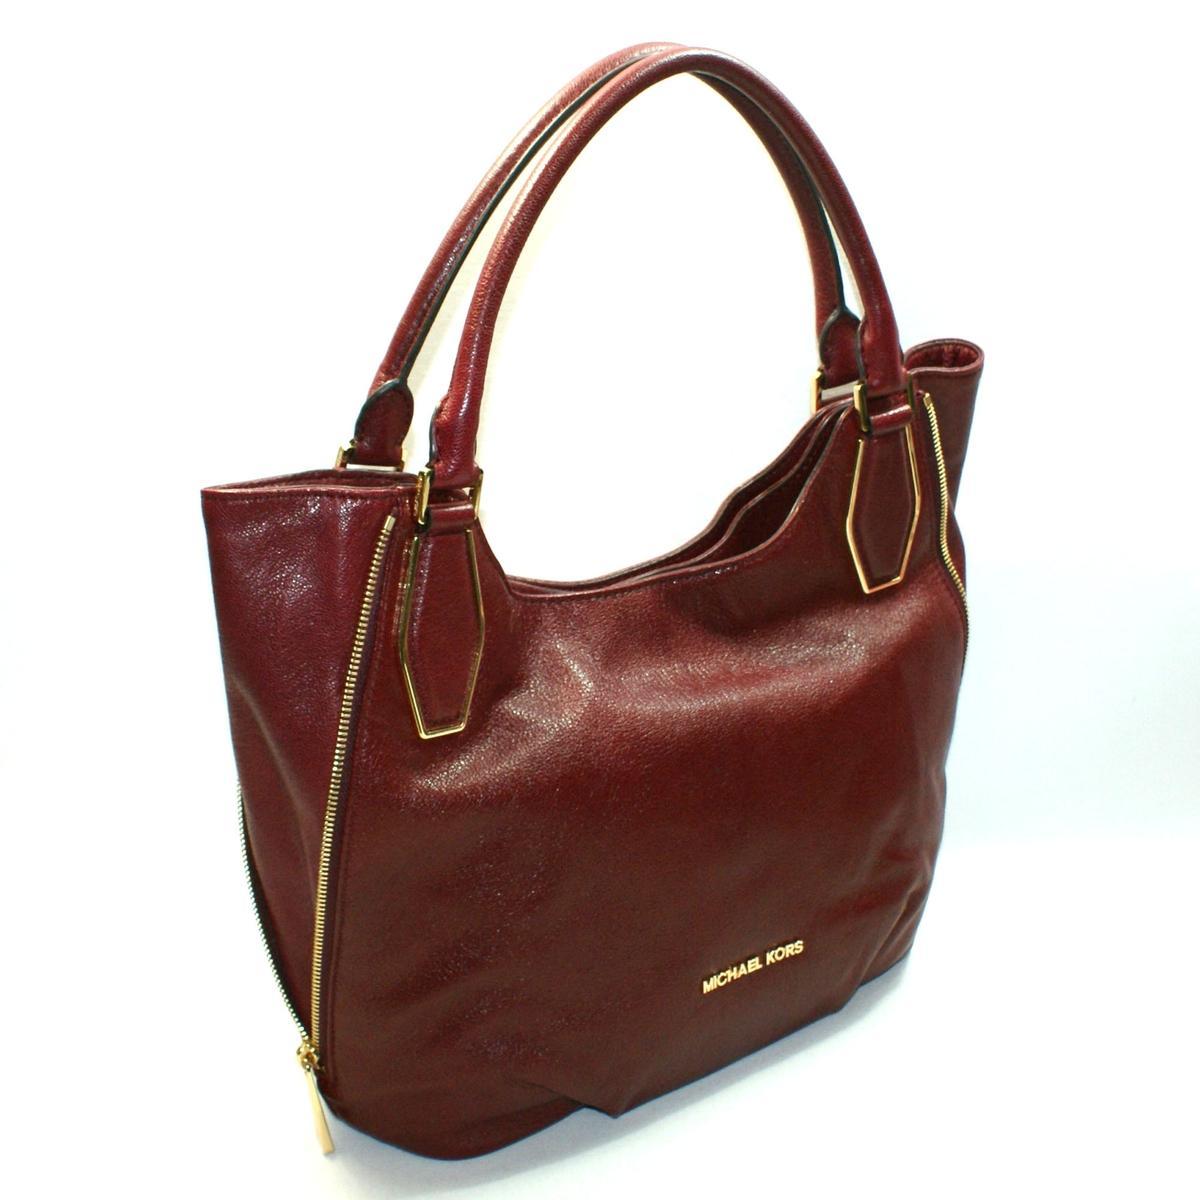 michael kors vanessa medium shoulder leather tote bag claret rh fashfires com